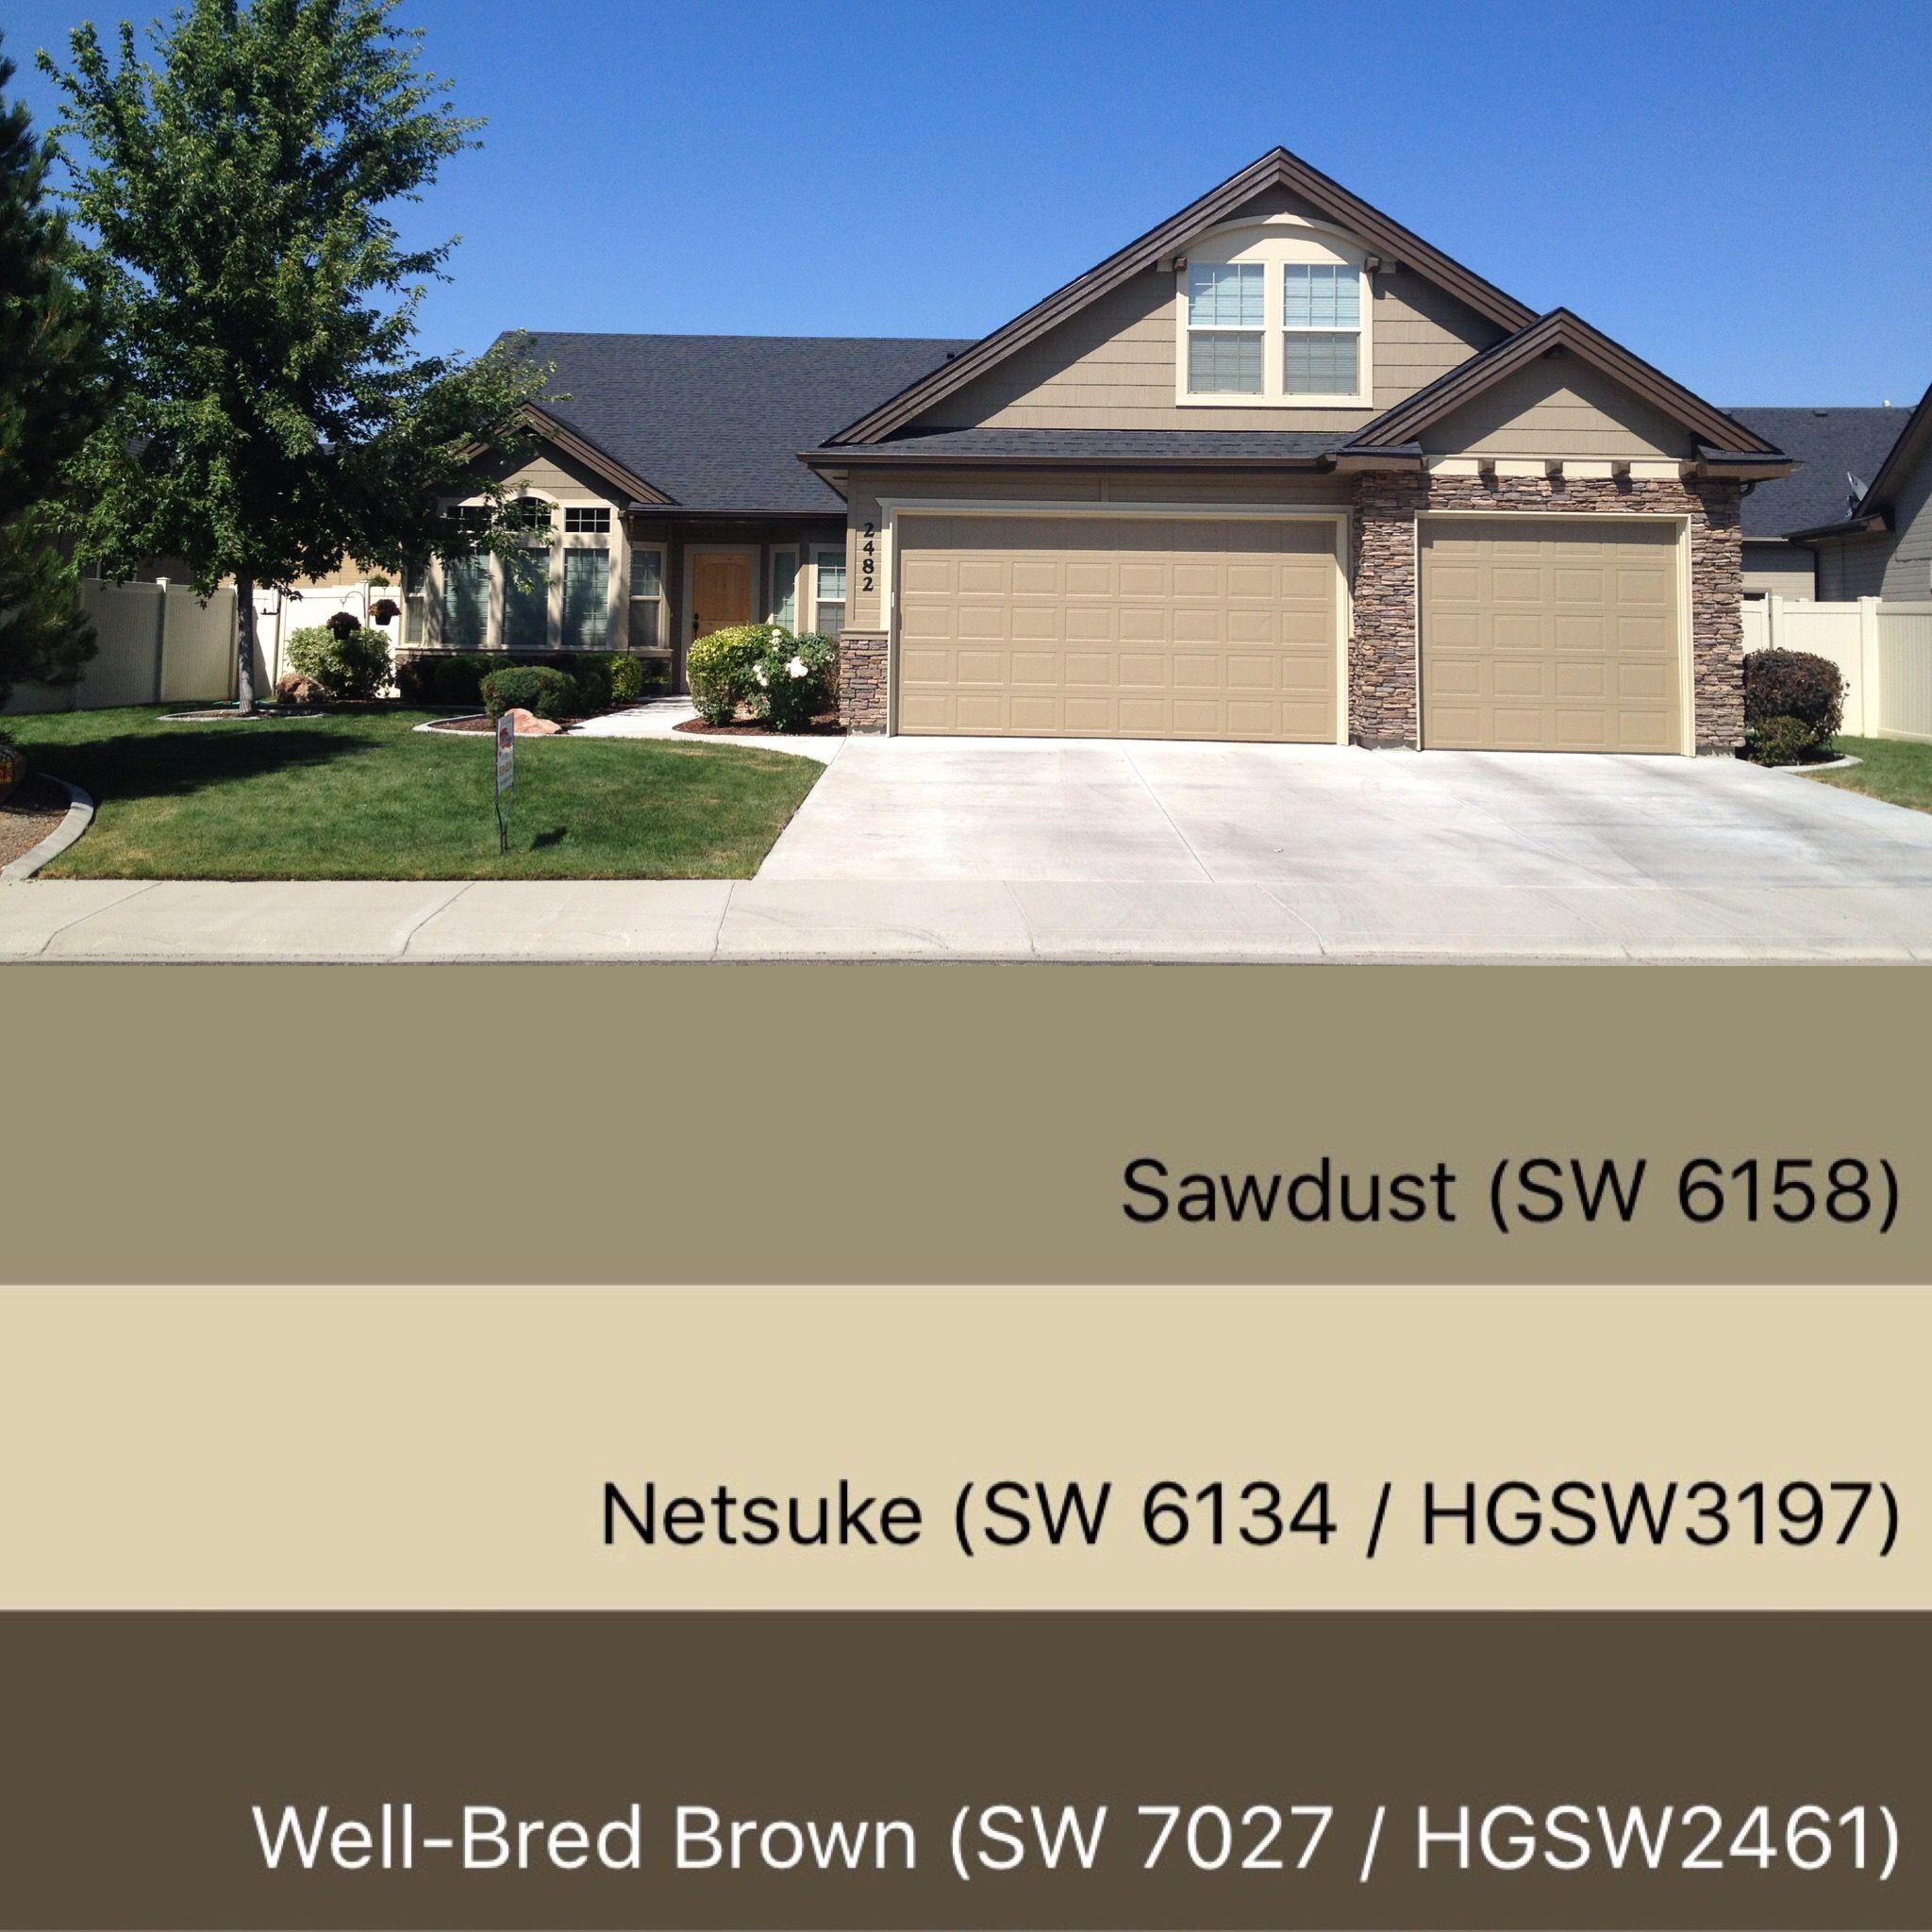 Sherwin Williams Paint Colors Sawdust 6158 Netsuke 6134